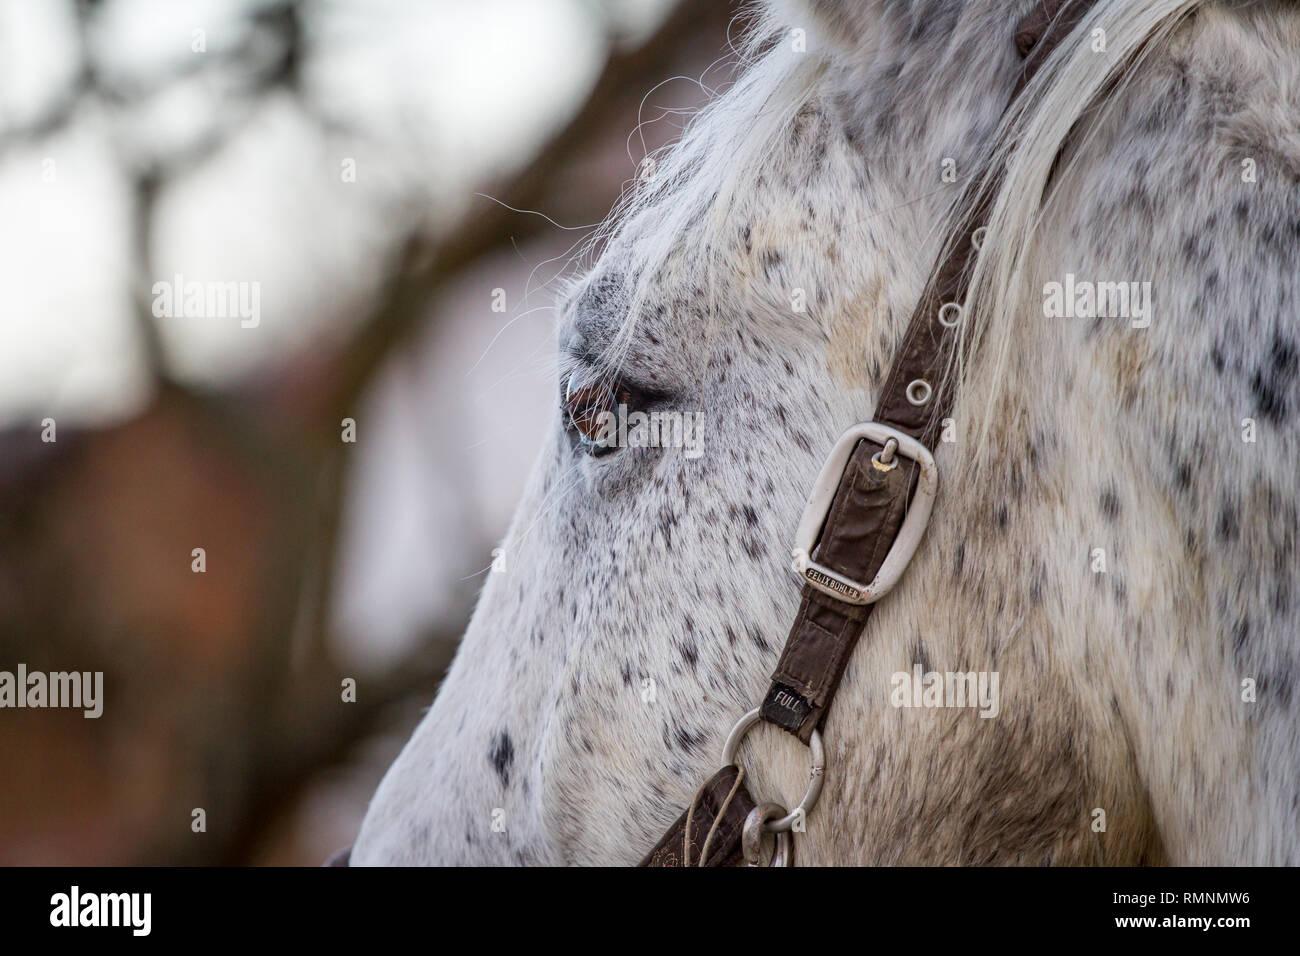 Dapple grey horse - Stock Image